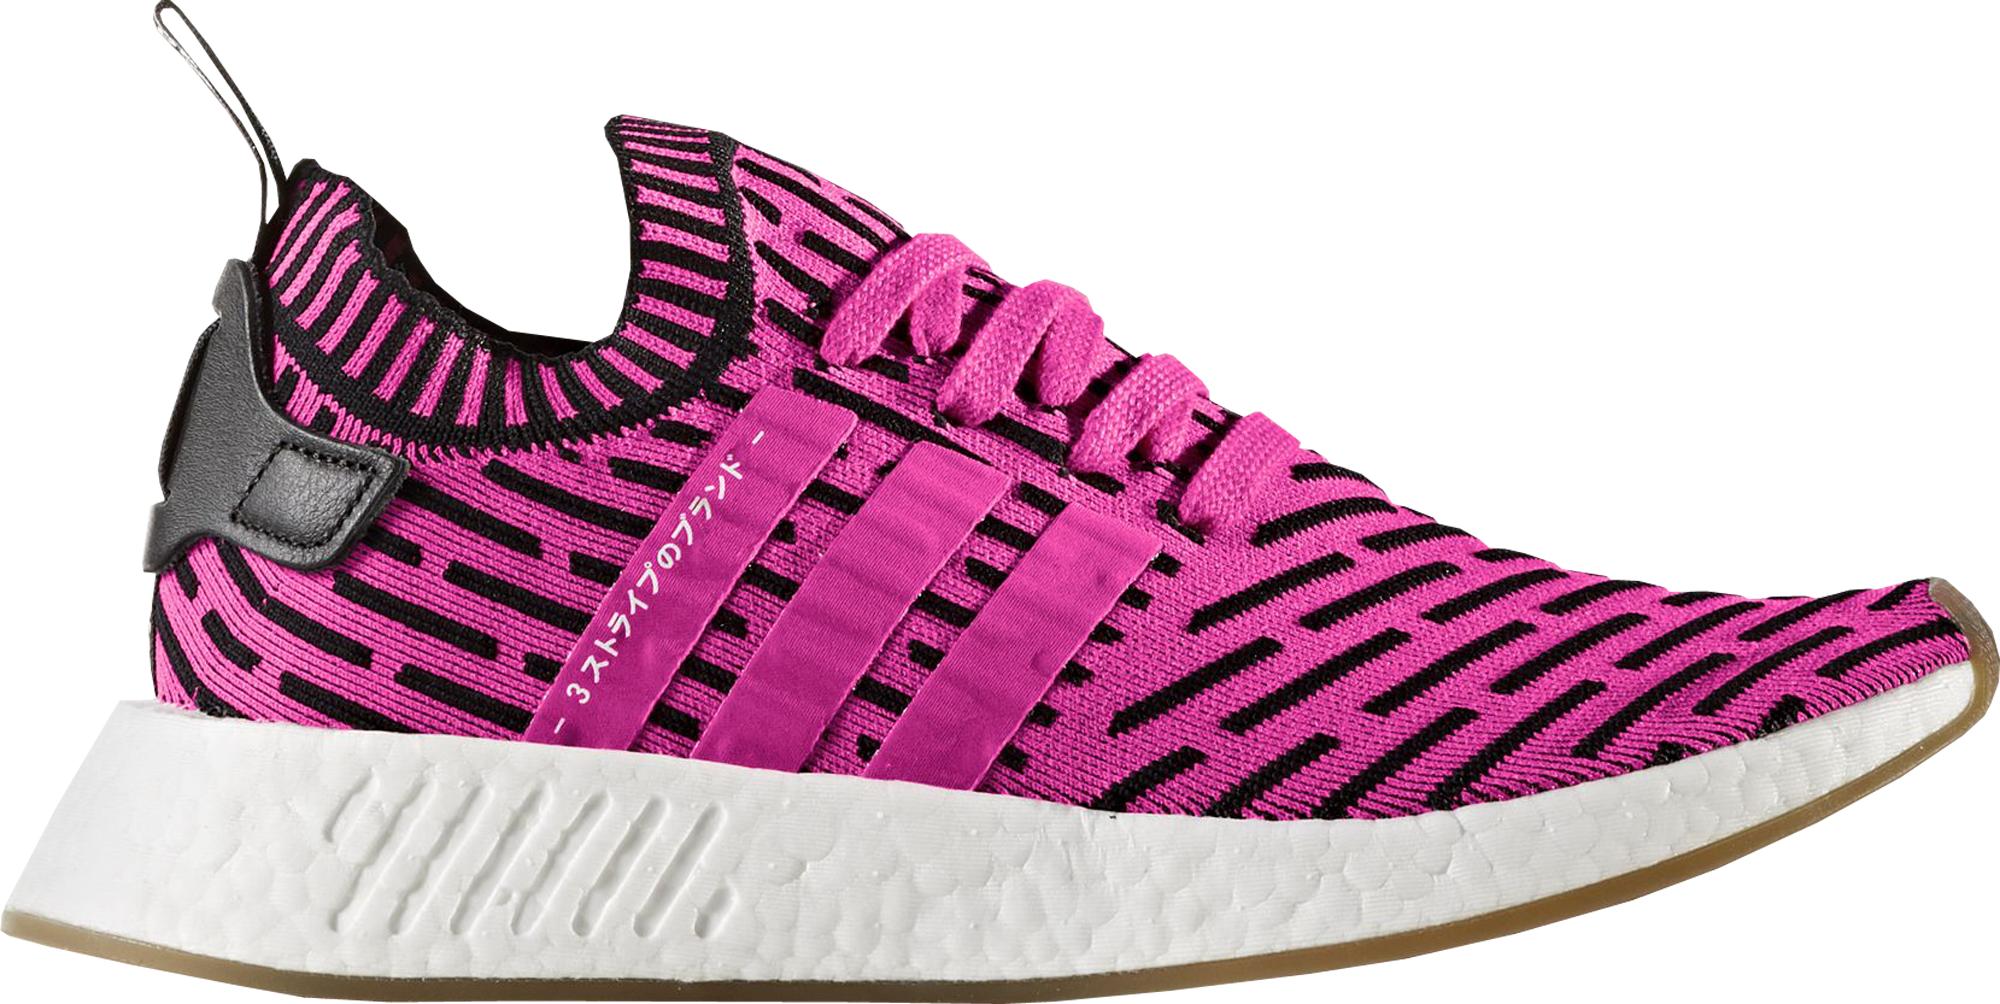 Adidas-NMD-R2-Japan-Shock-Pink.png